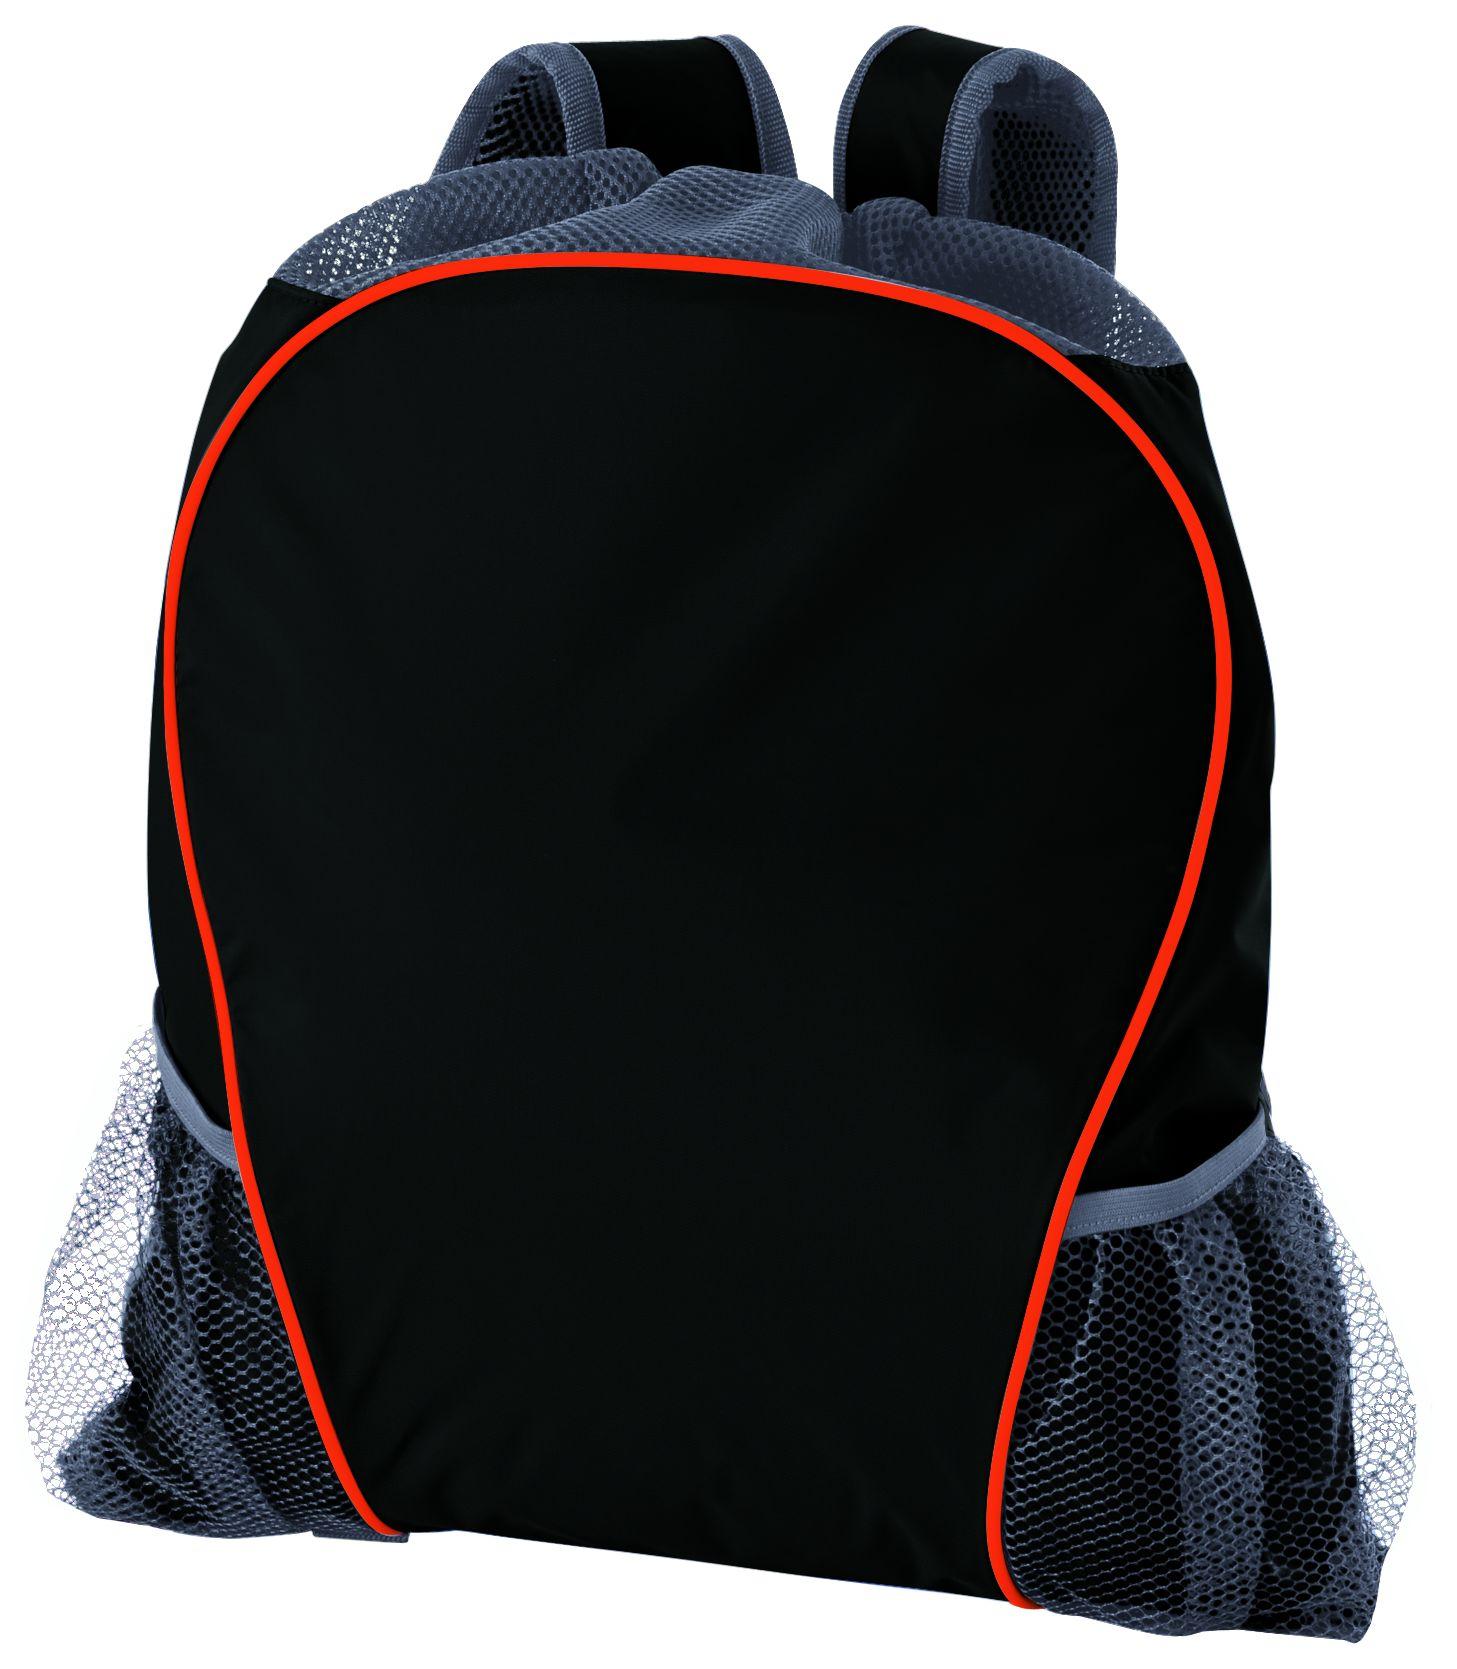 Rig Bag - BLACK/GRAPHITE/ORANGE